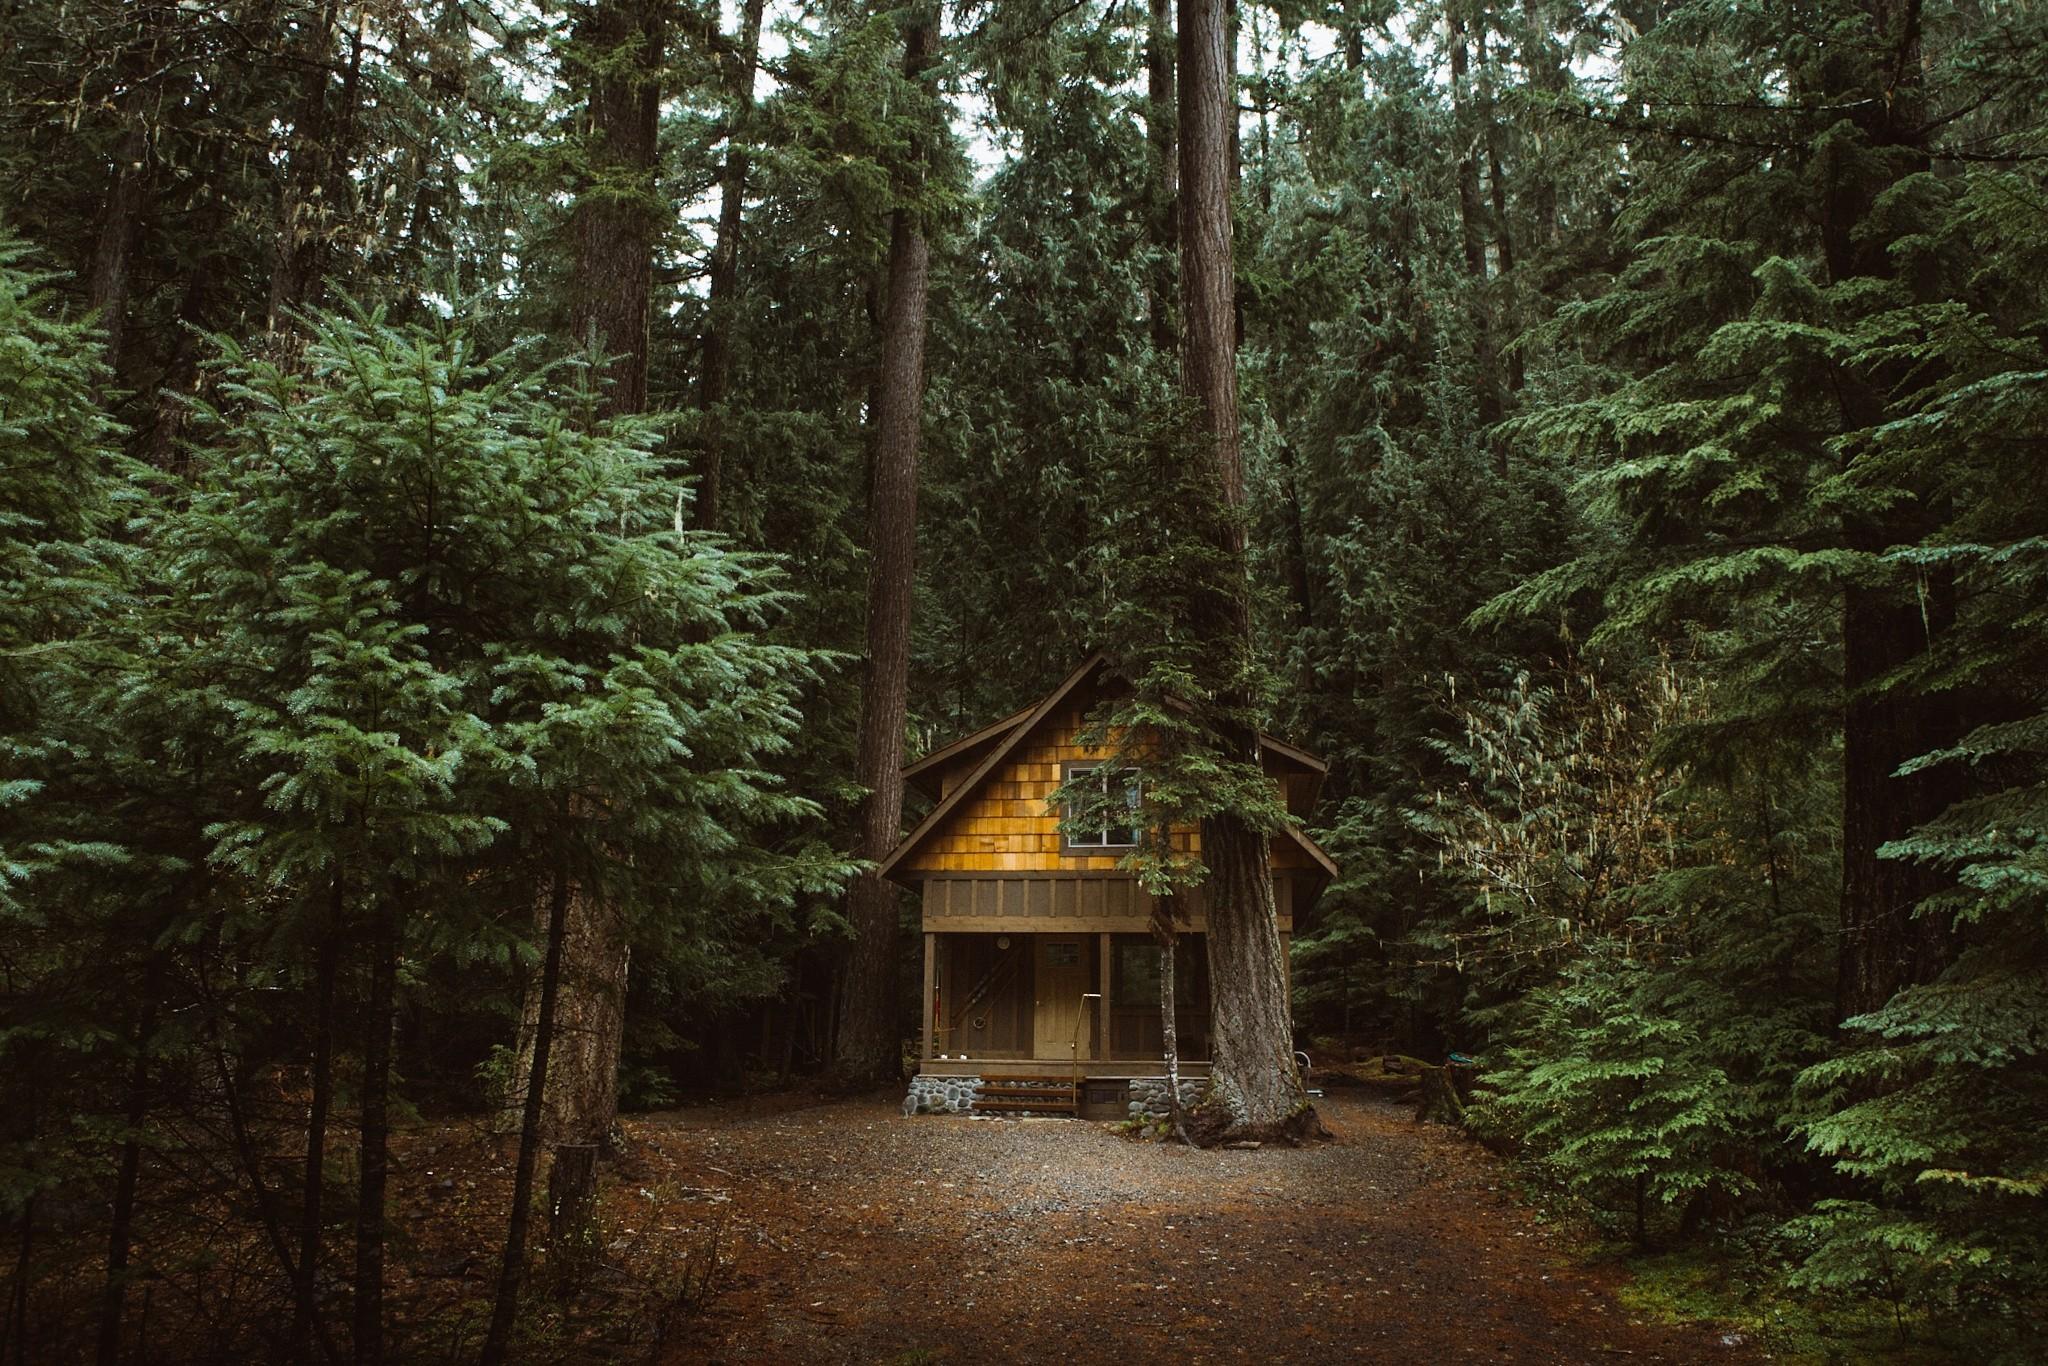 дом на окраине леса картинки ученичества любом деле